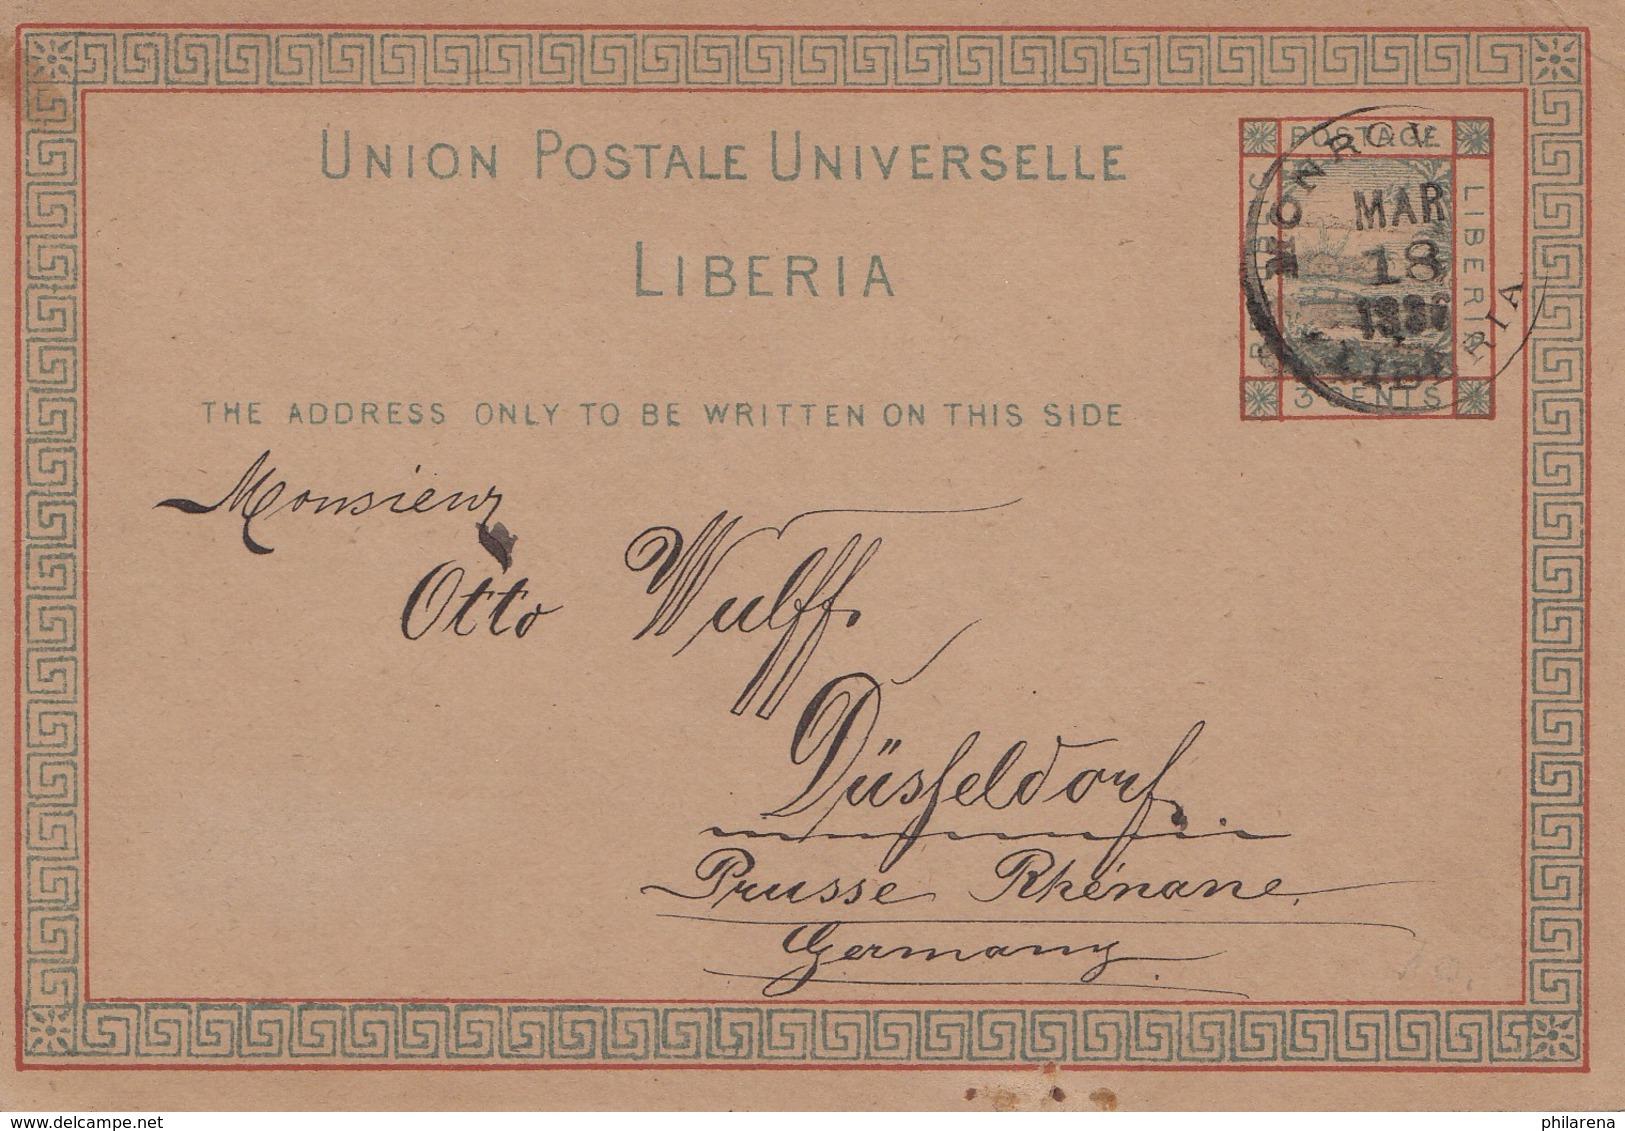 Liberia: 1936: Monrovia To Düsseldorf, Post Card - Liberia